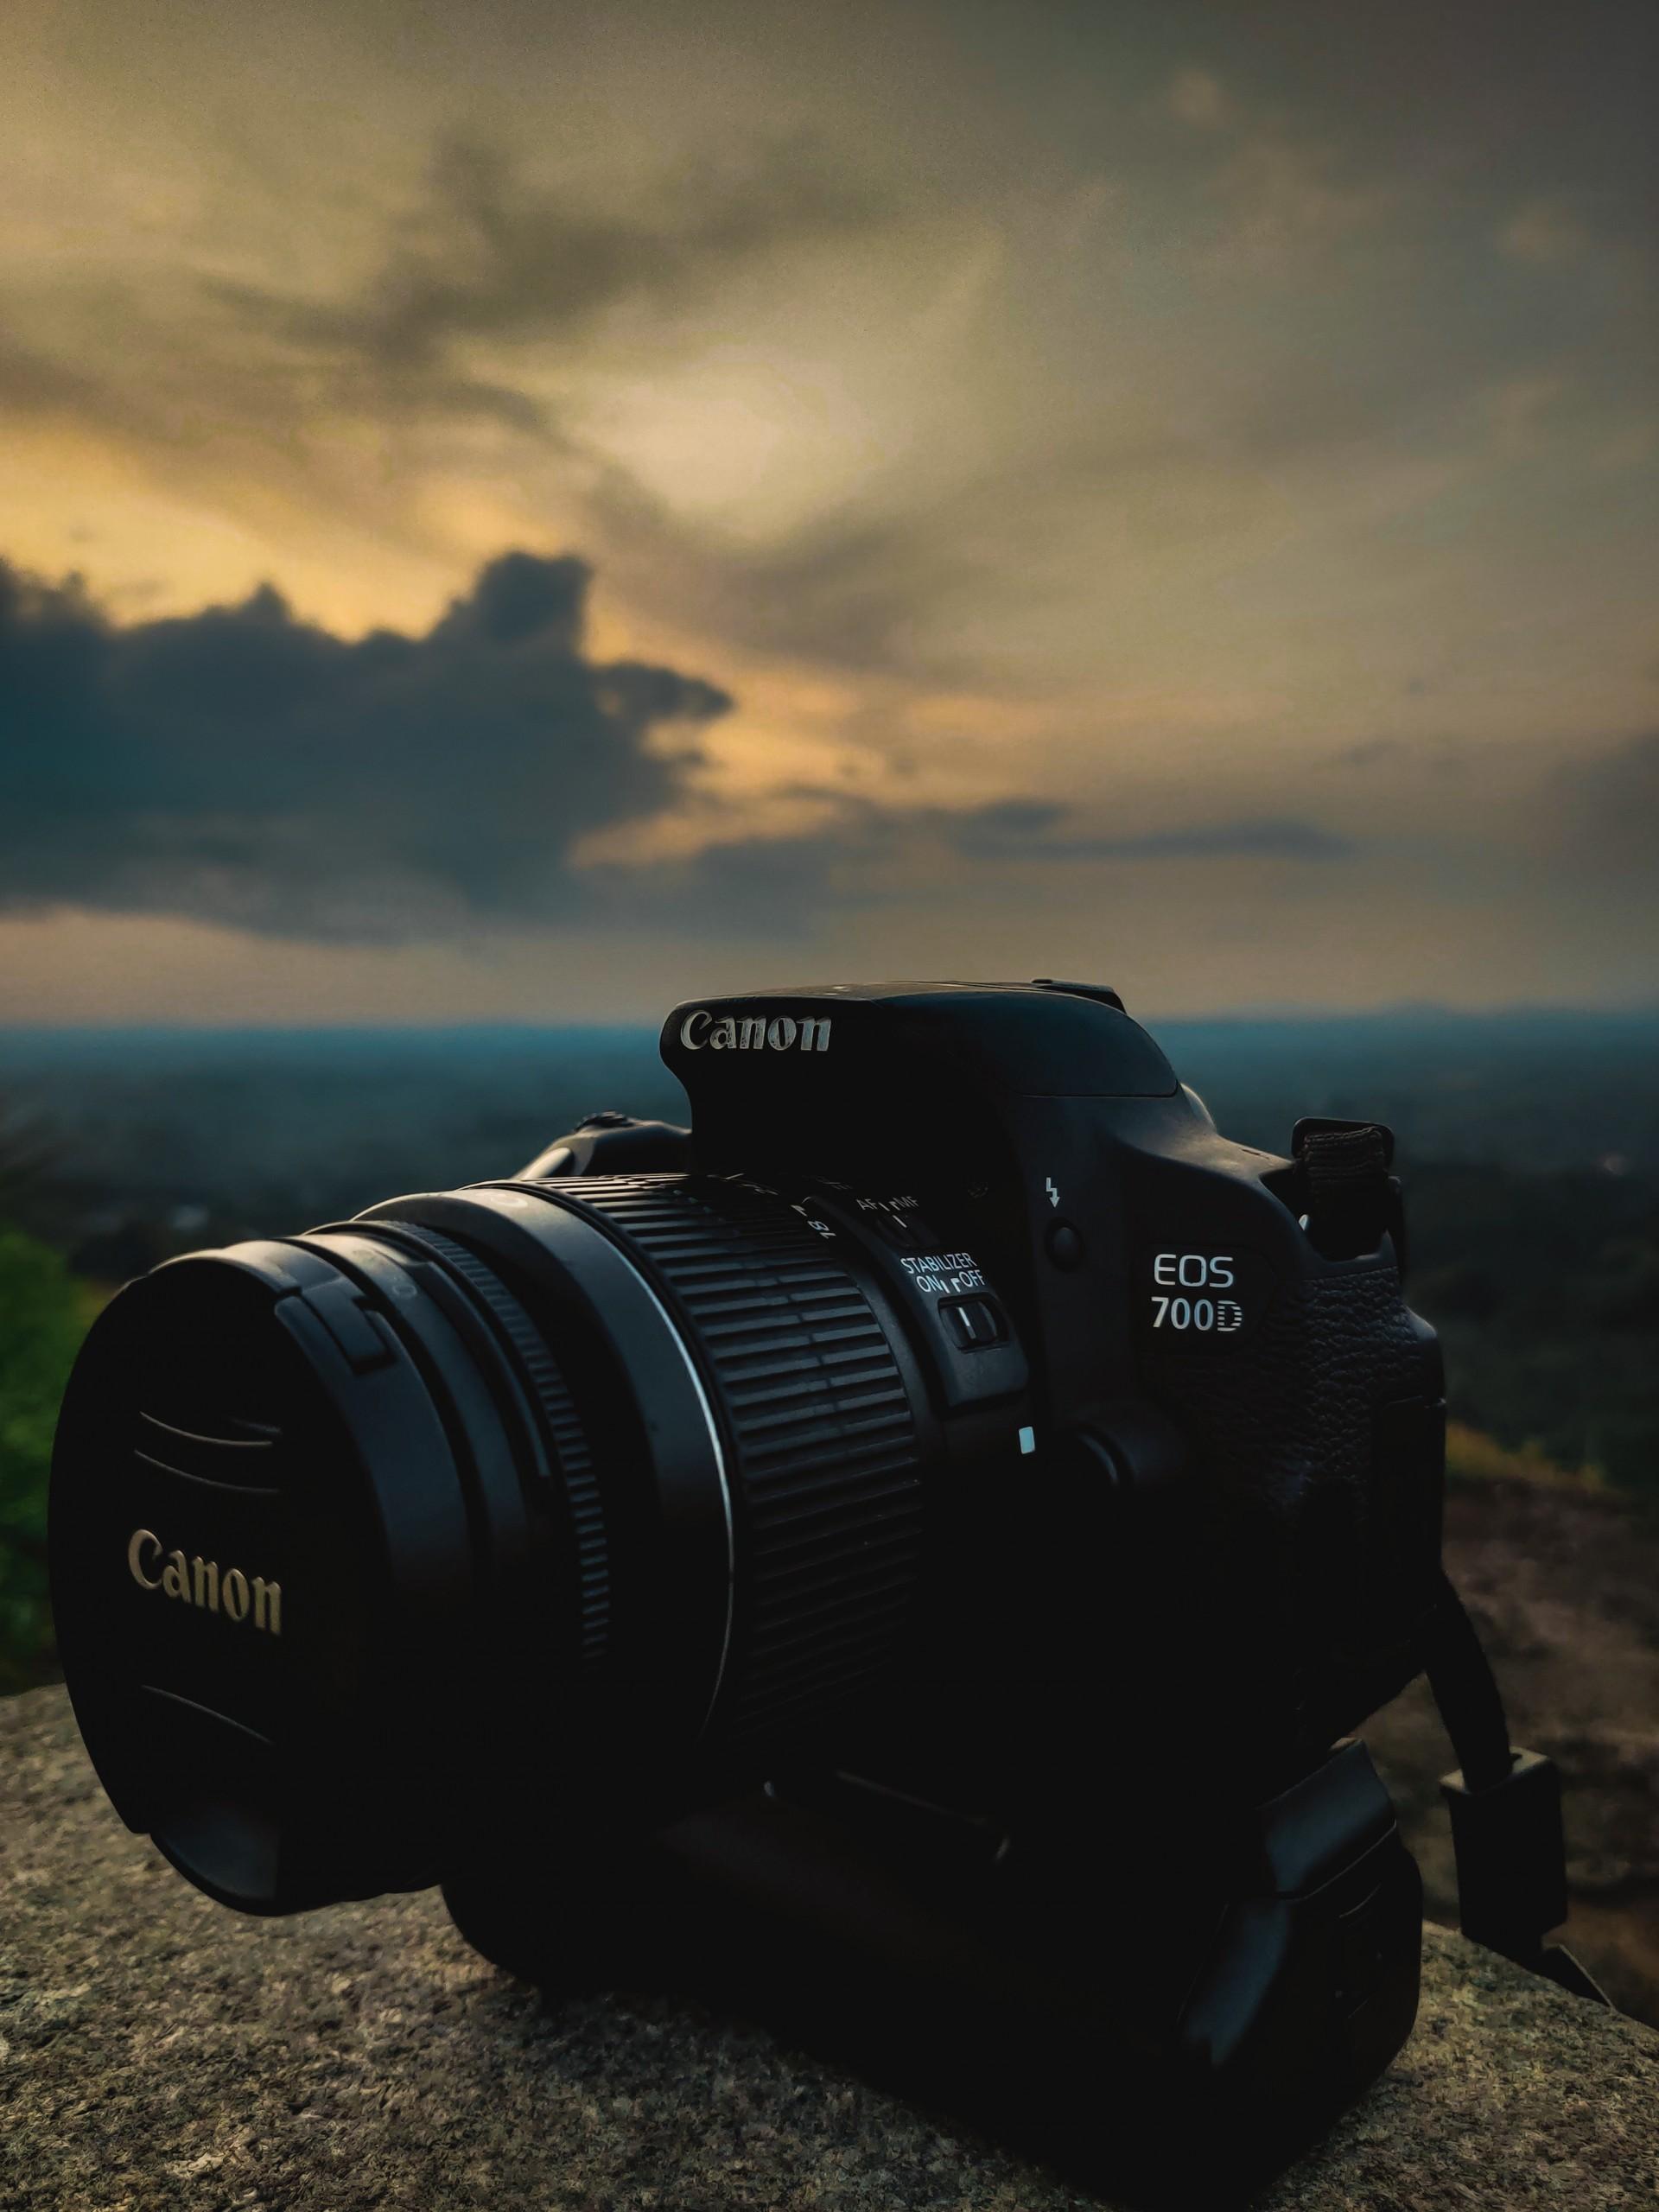 Canon DSLR Photography Camera